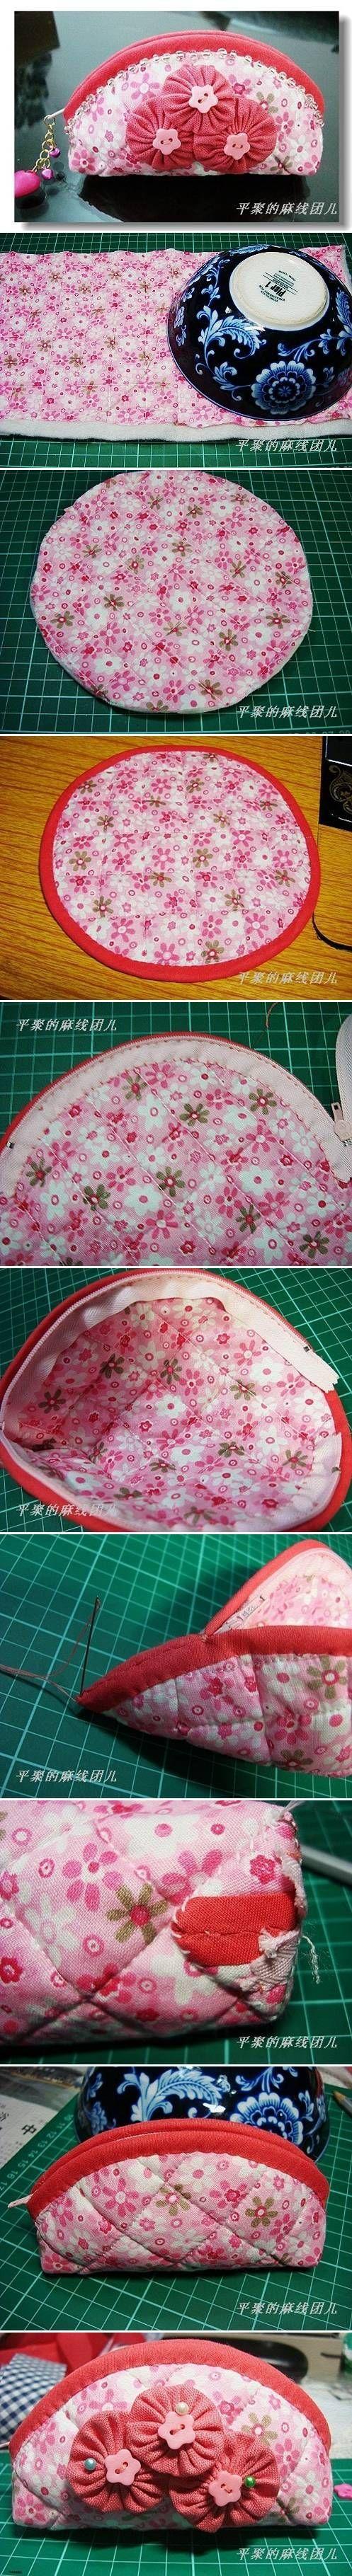 DIY Rosa bolsa con flores http://manualidades.facilisimo.com/foros/mas-manualidades/club-de-las-amigas-de-las-manualidades_1130180_472.html